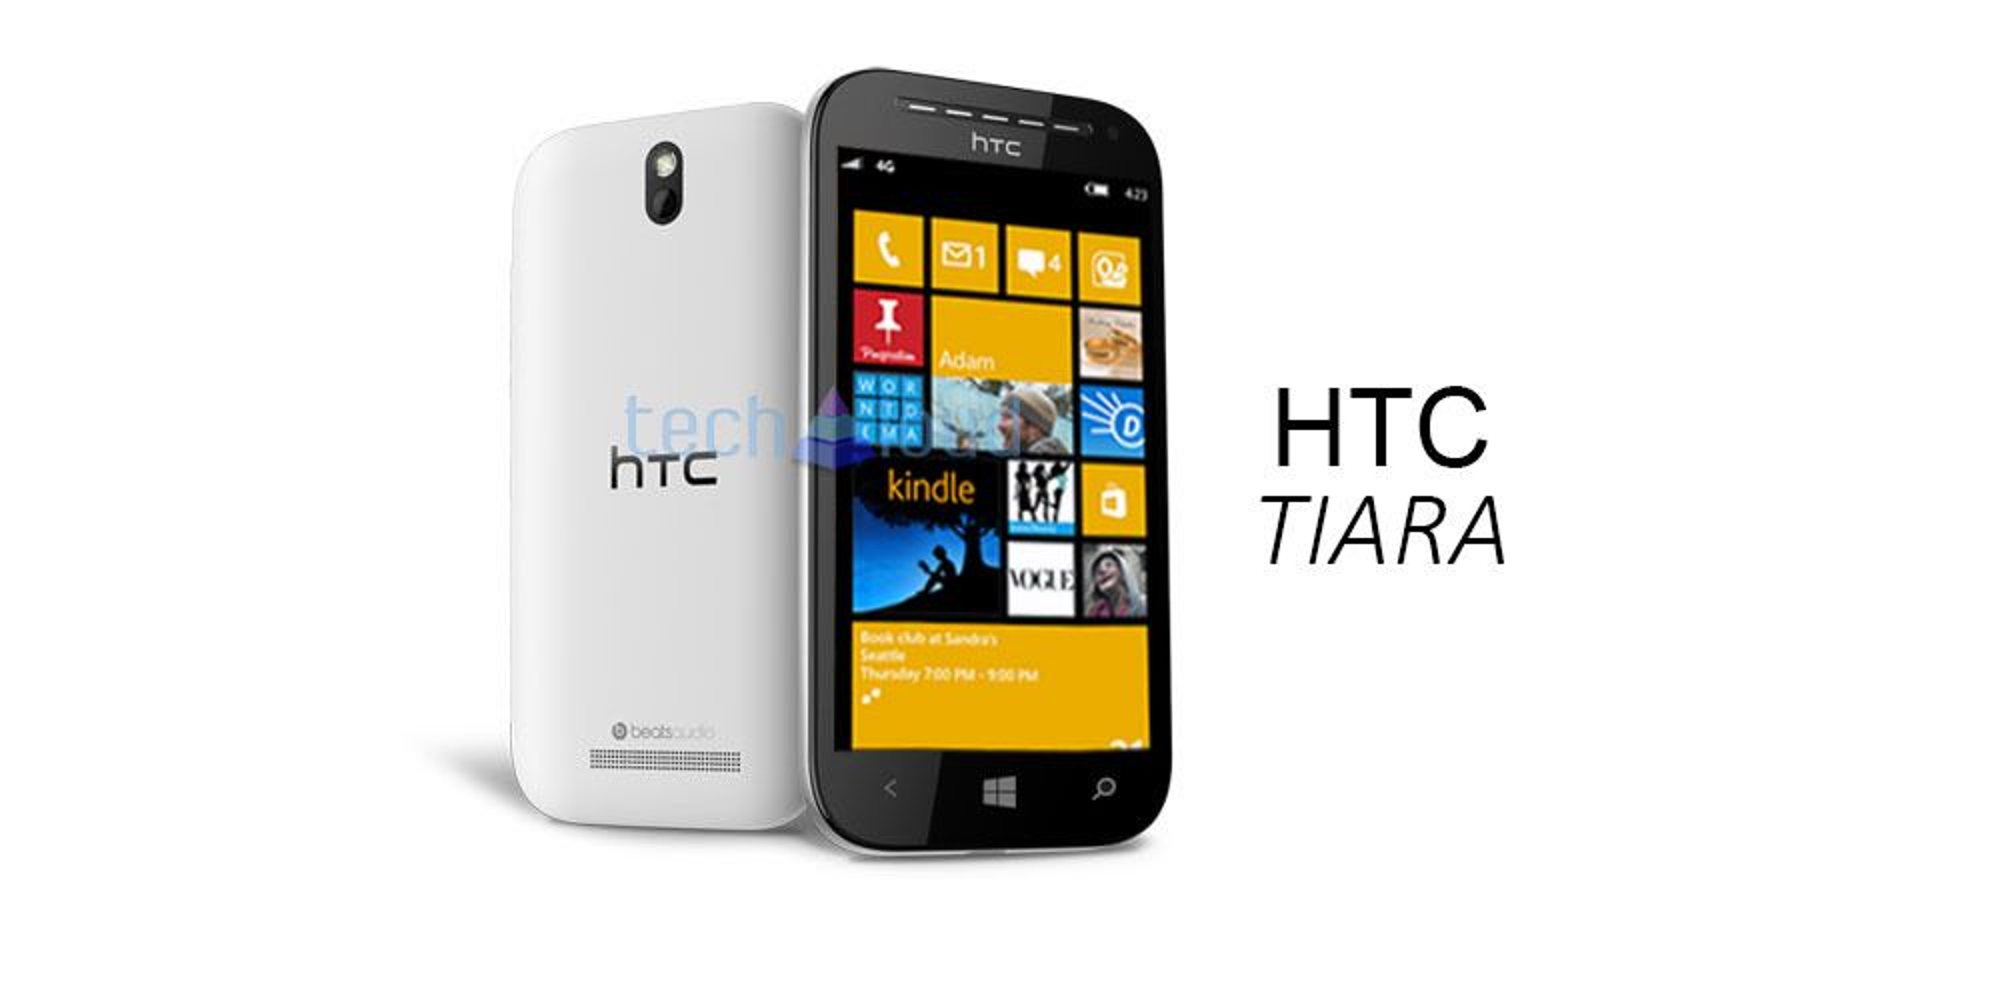 Her er HTC Tiara